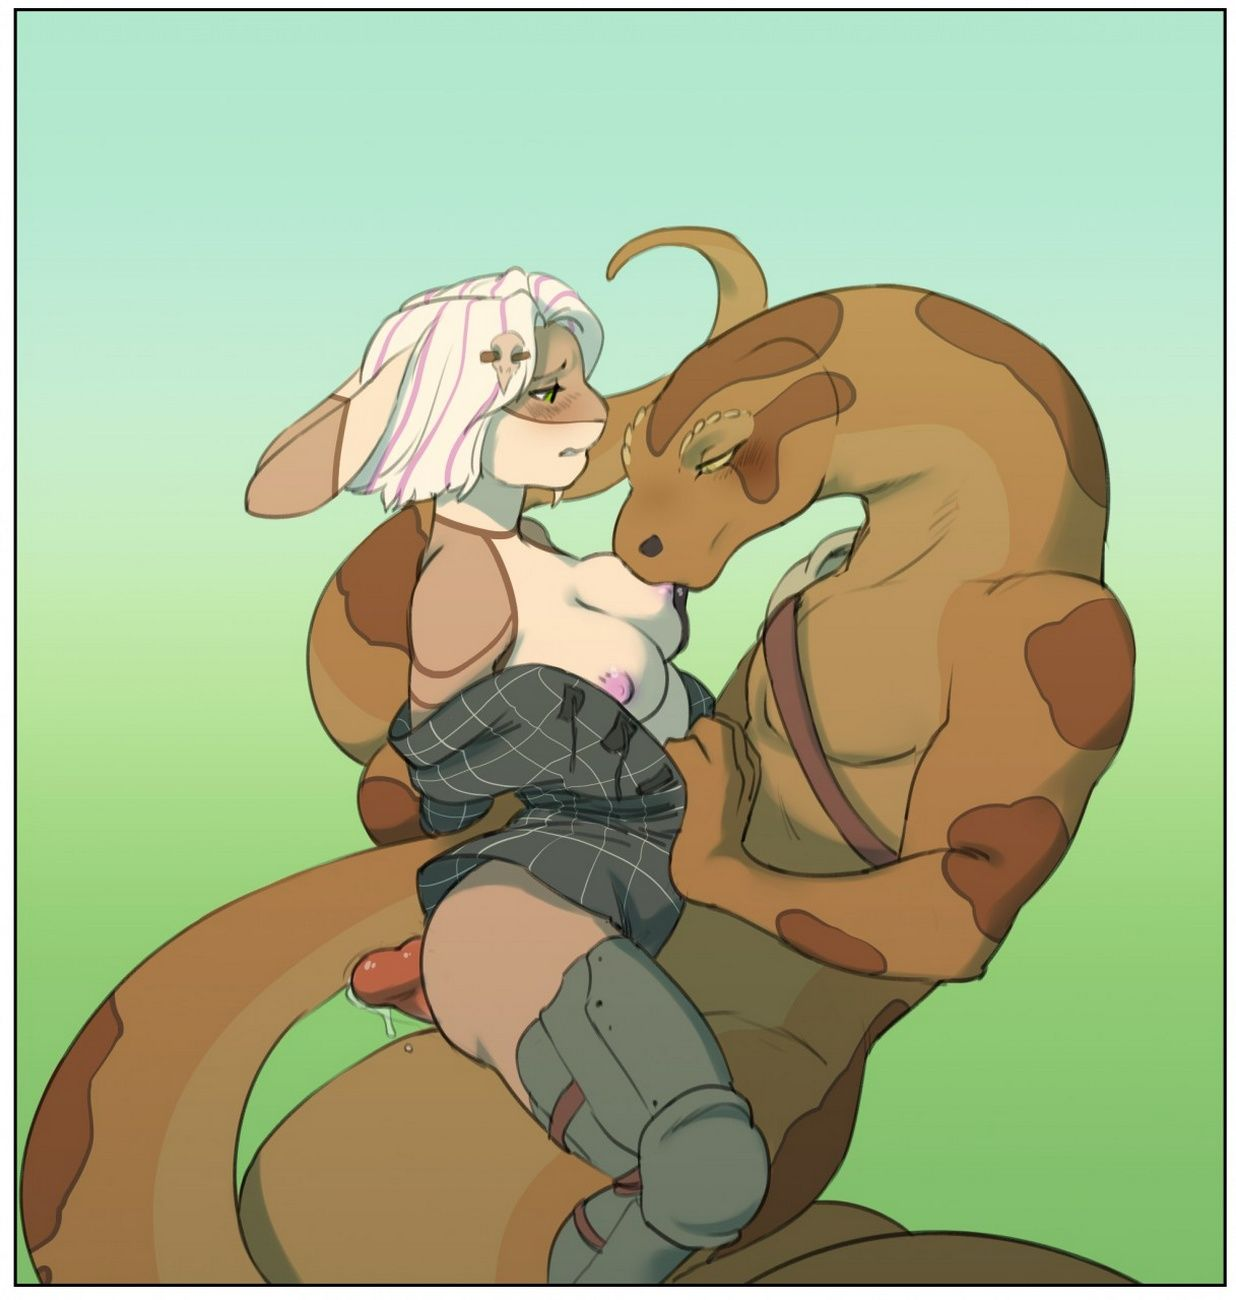 Dragon age origins porn pic naked clip